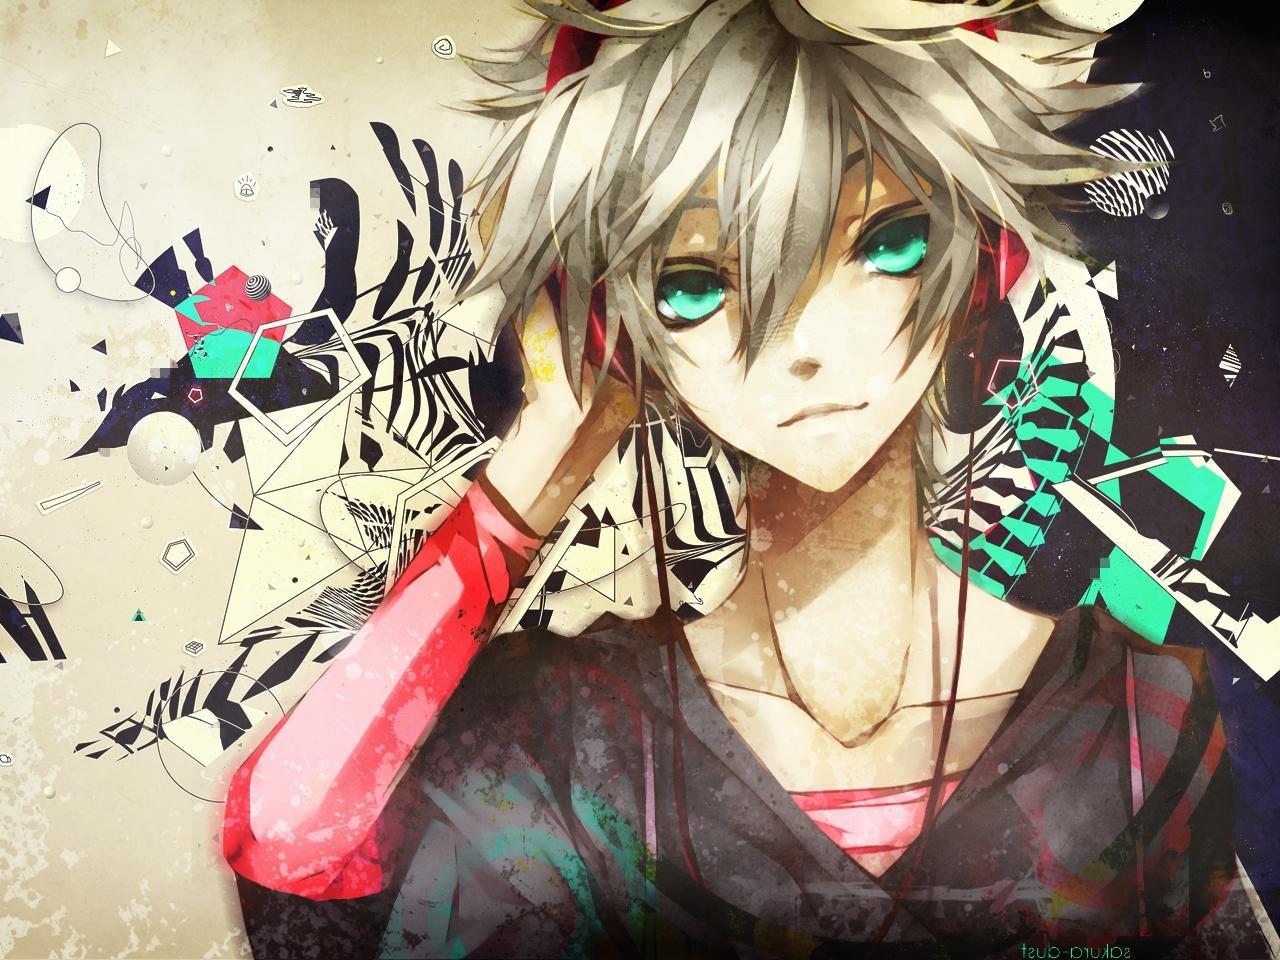 Hot Anime Guy Wallpaper Hd   Wallpaper HD Collection 1280x960